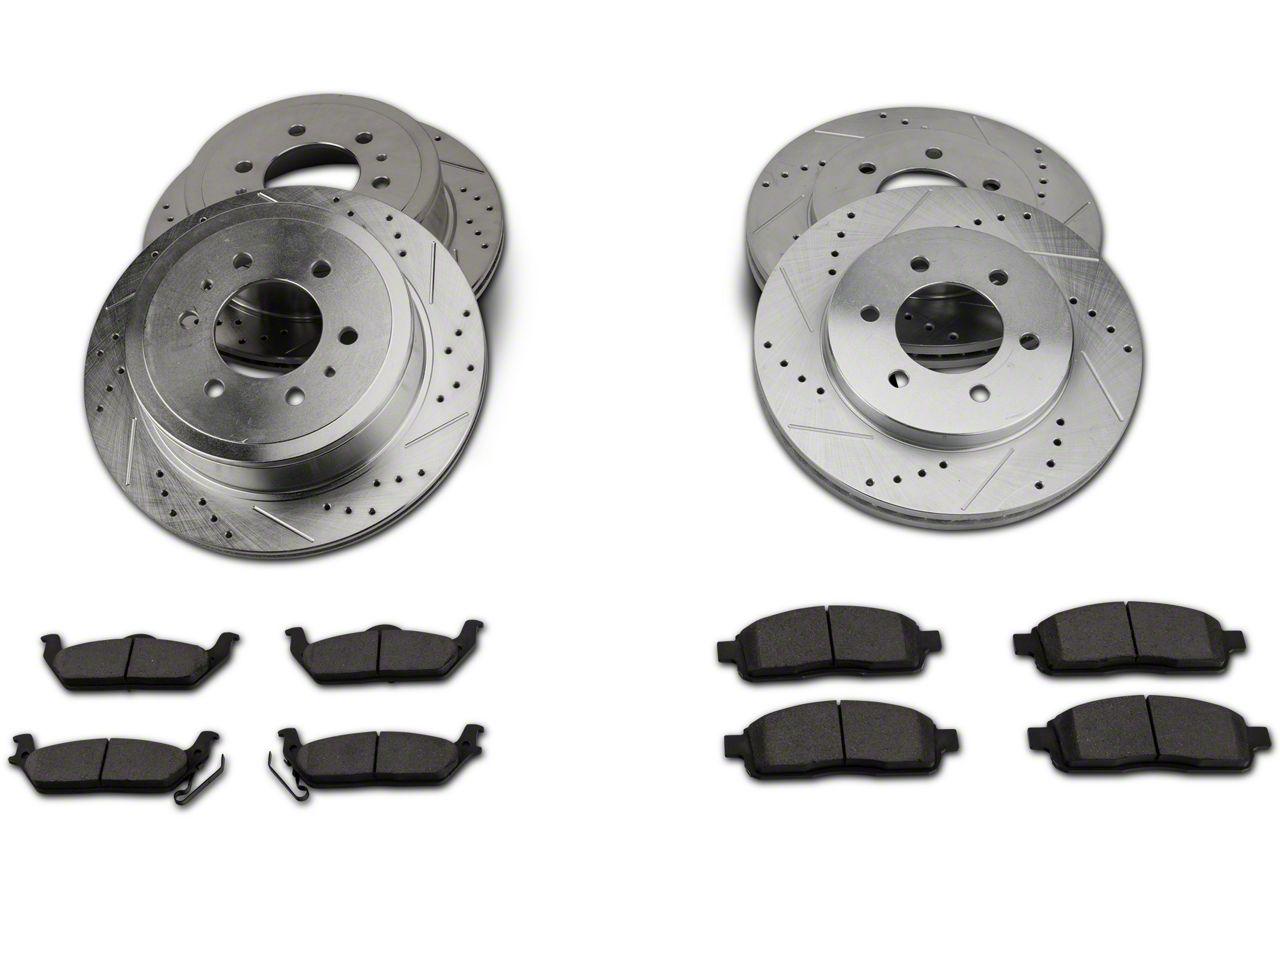 Power Stop Z23 Evolution Sport 6-Lug Brake Rotor & Pad Kit - Front & Rear (04-08 4WD F-150)